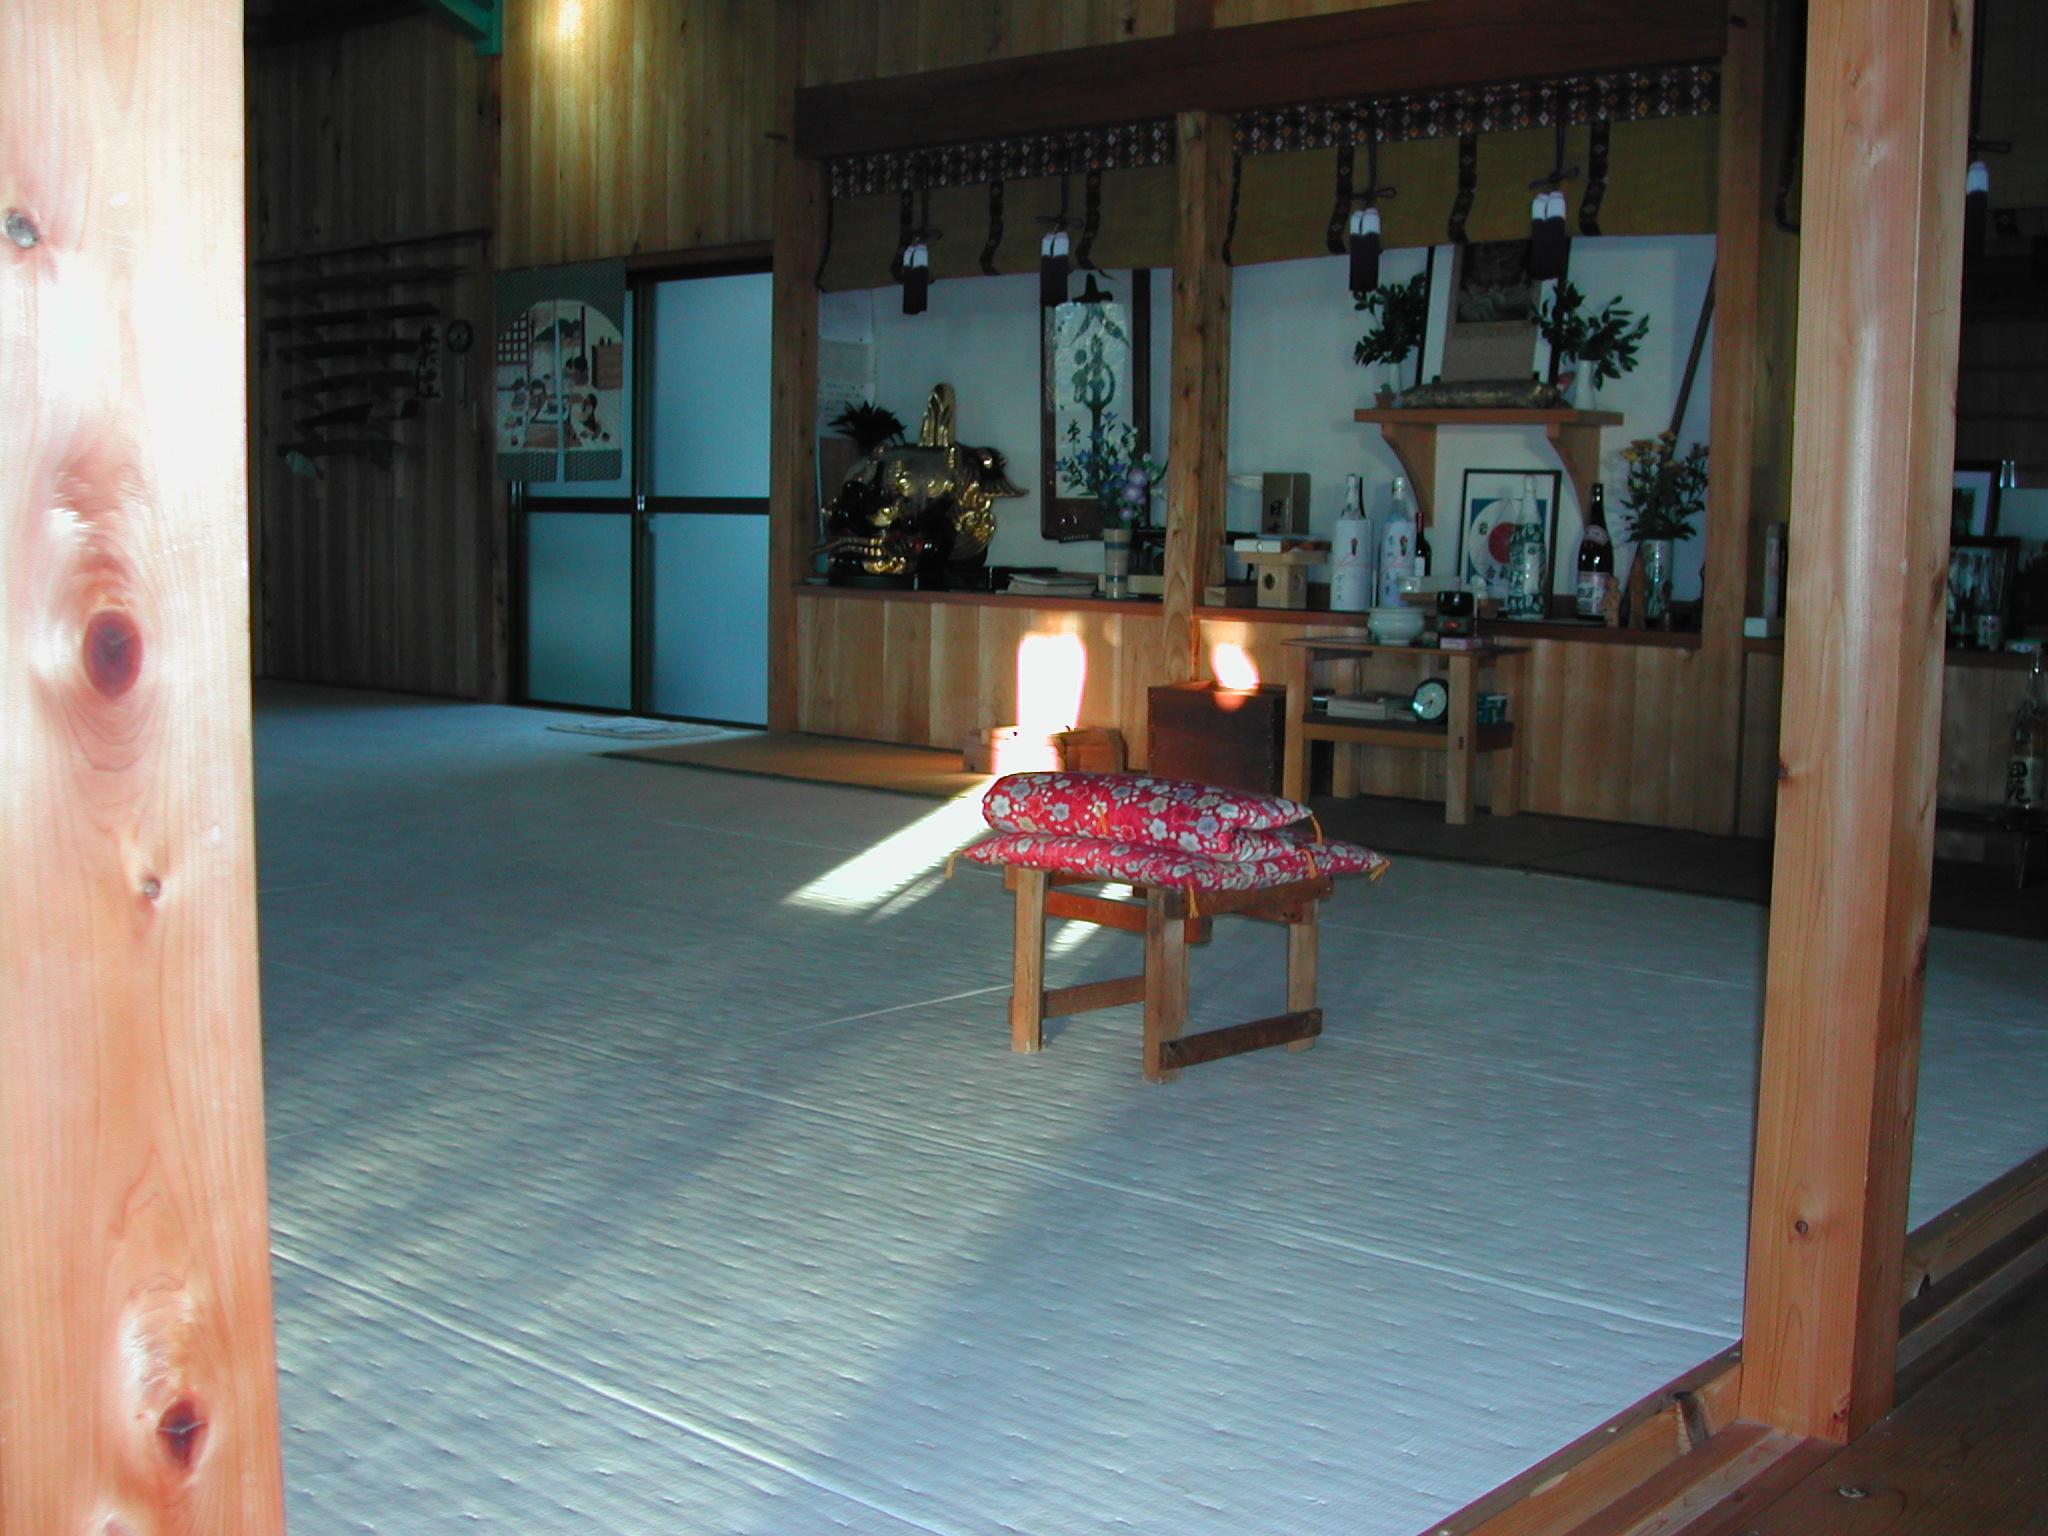 088Iwama'04.jpg